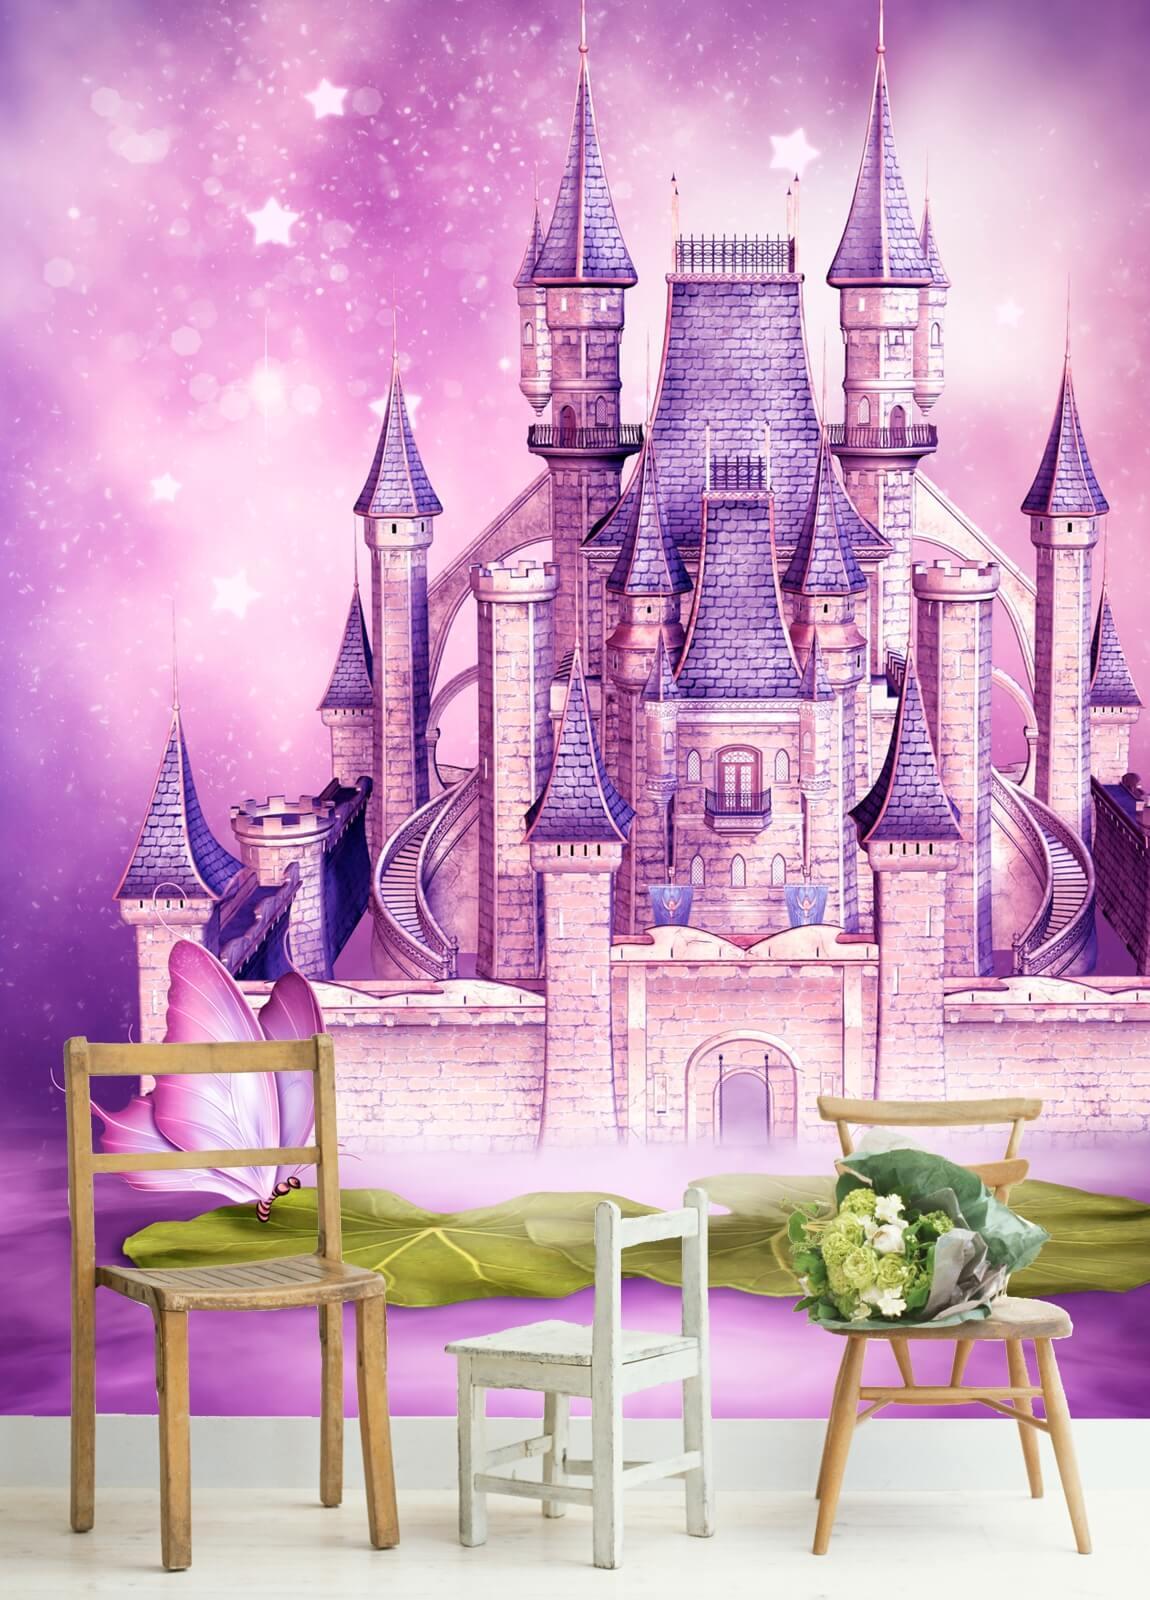 Full Size of Prinzessinnen Kinderzimmer Playmobil Prinzessin Gebraucht Prinzessinen Bett Pinolino Karolin Lillifee Komplett Vlies Tapete Fototapete Schloss Rosa Regal Weiß Kinderzimmer Kinderzimmer Prinzessin